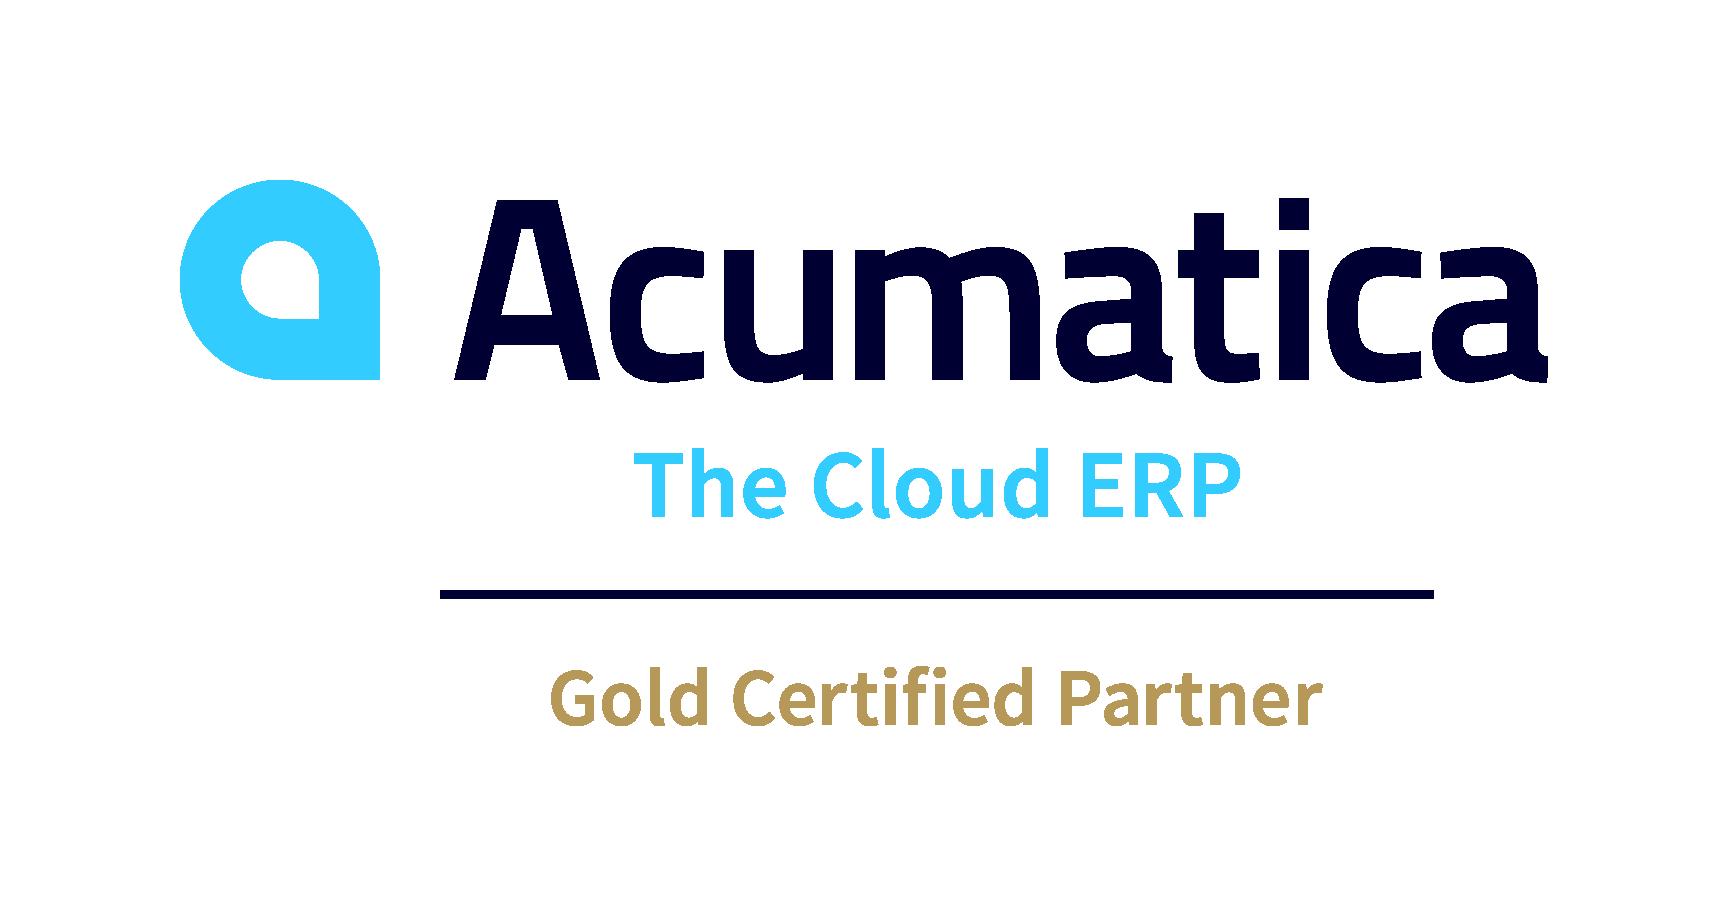 Acumatica Cloud ERP Products